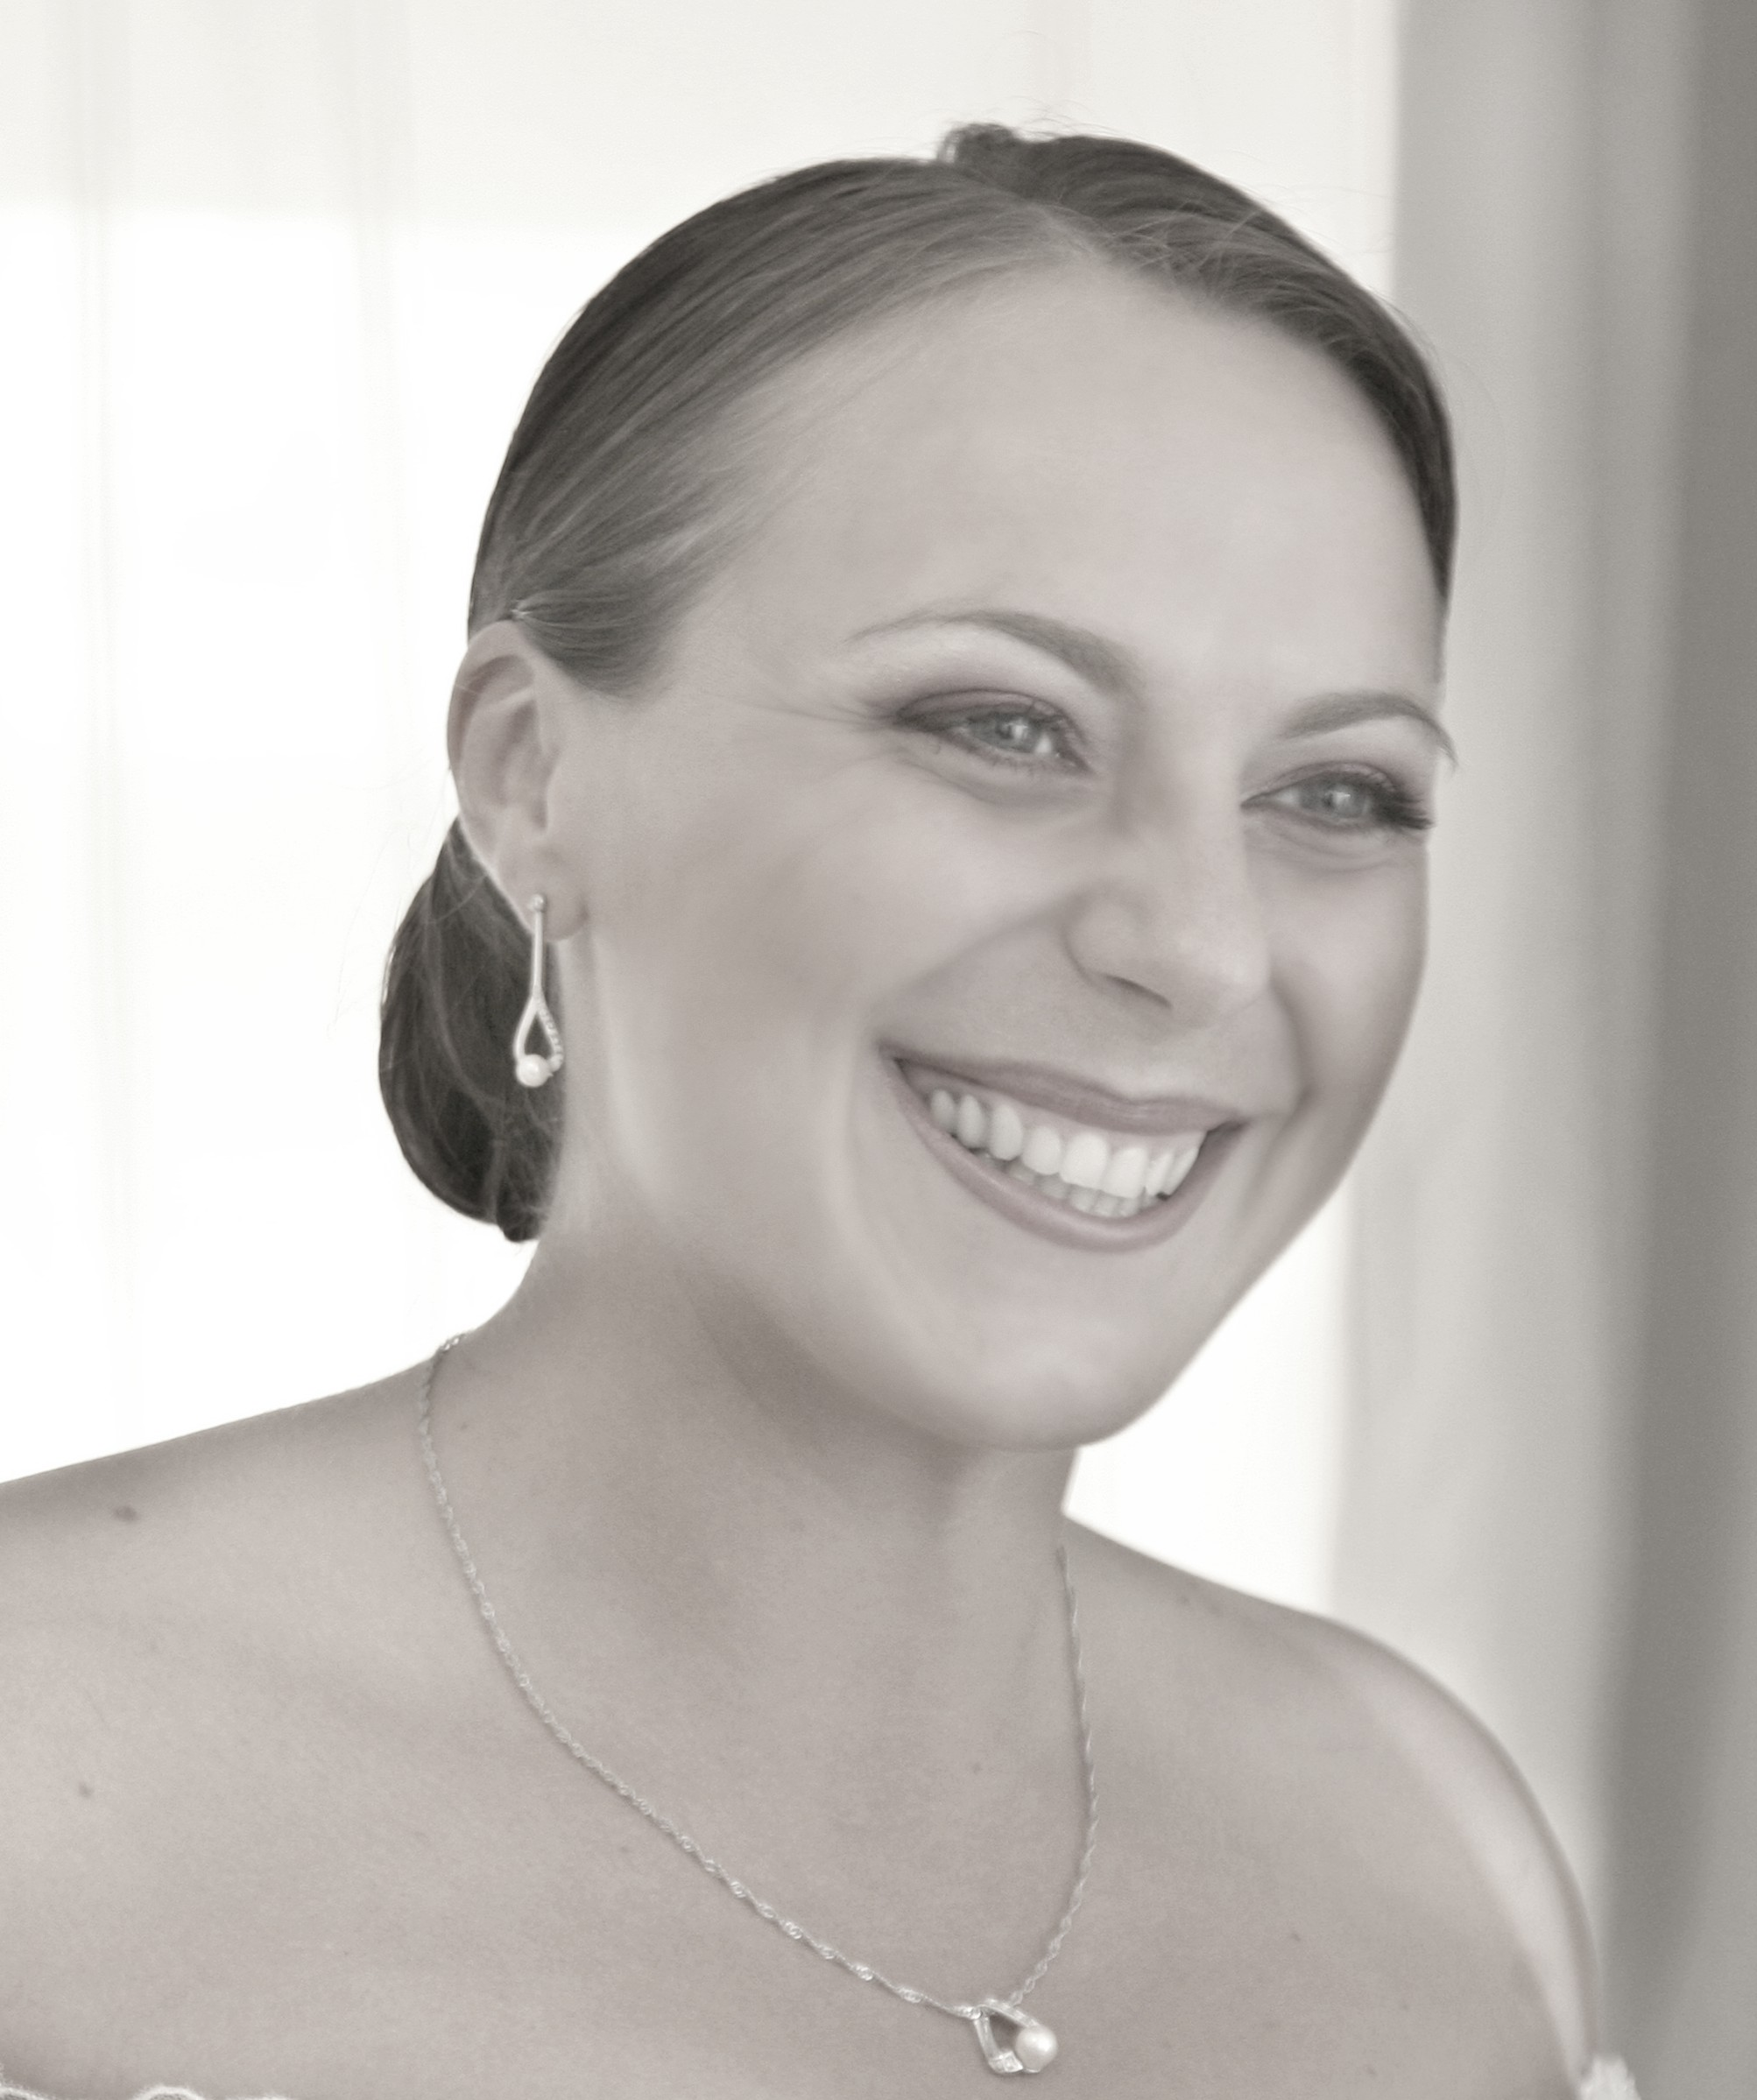 Anna Attanasio